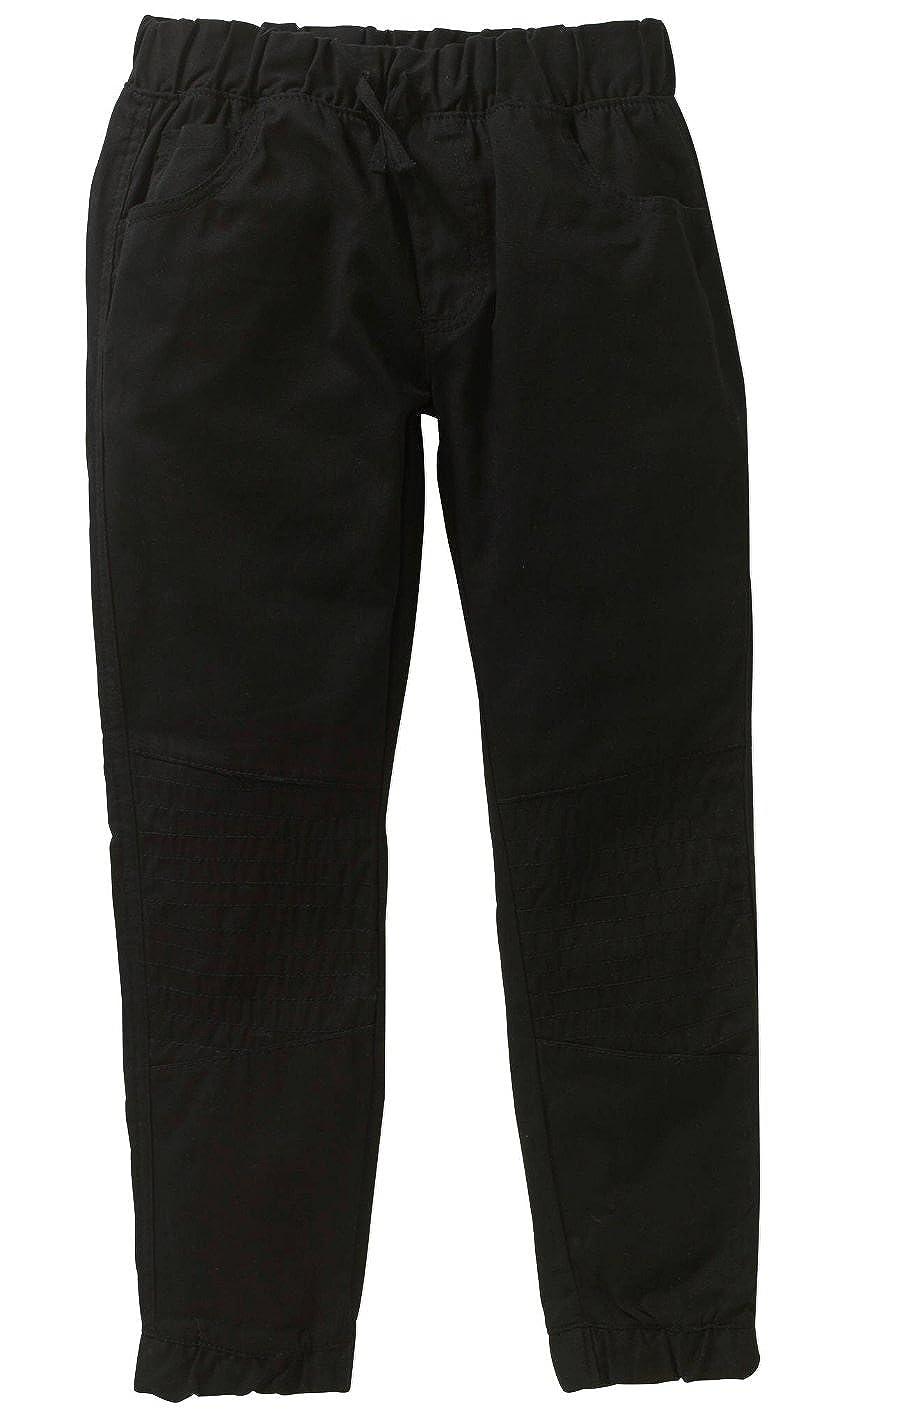 Small 4, Midnight Blac Label Boys Twill Cargo Jogger Pants,